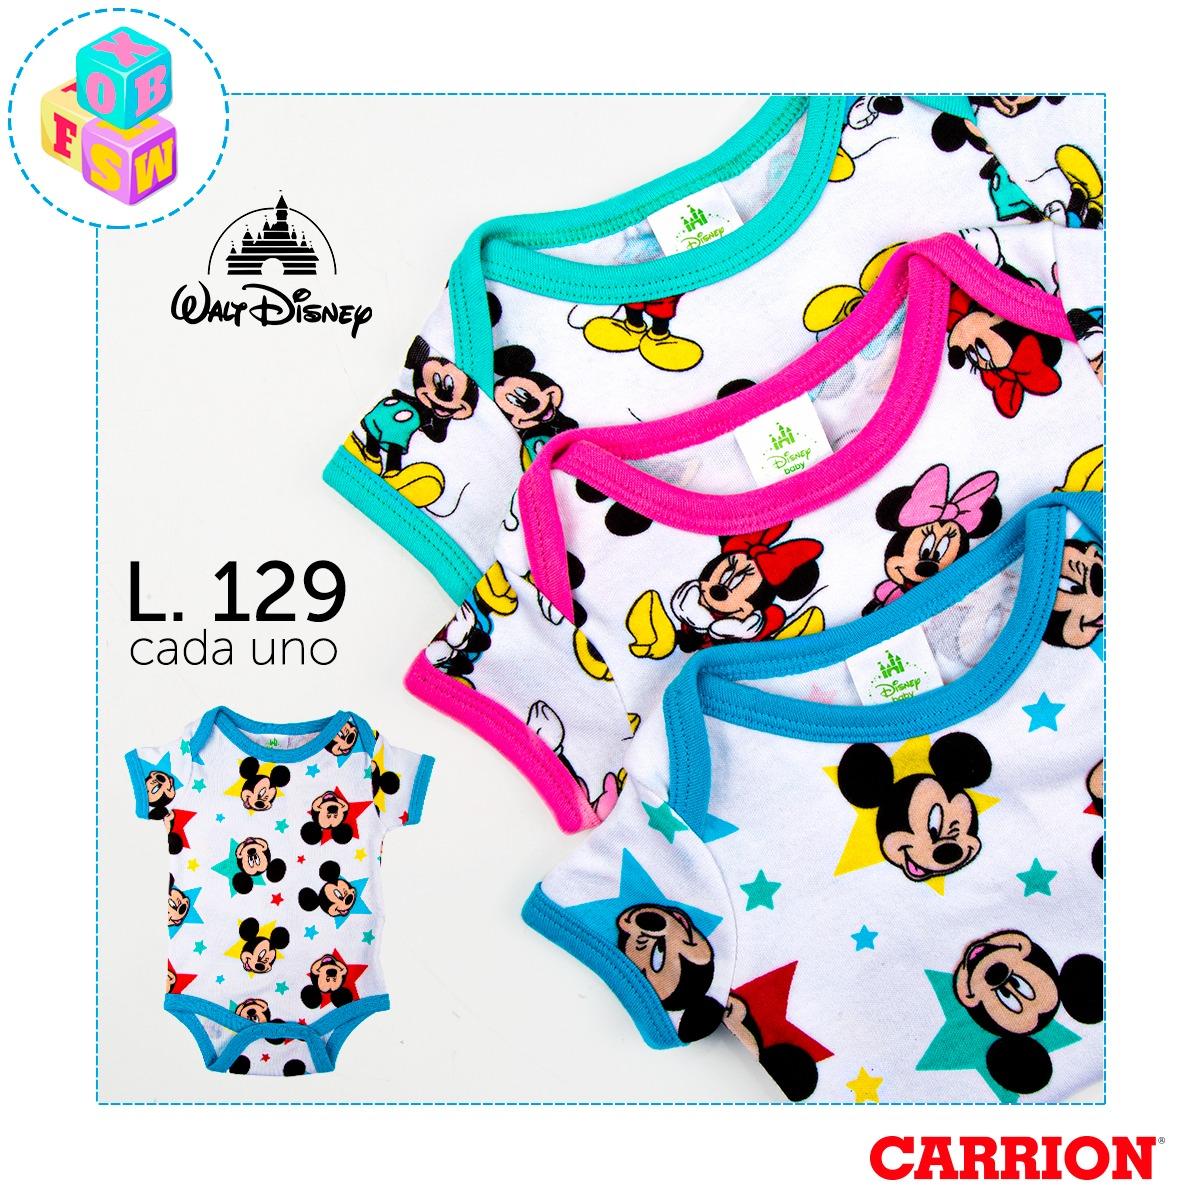 Mamelucos Disney, diferentes colores 🥰 https://t.co/IPcToGYUrB